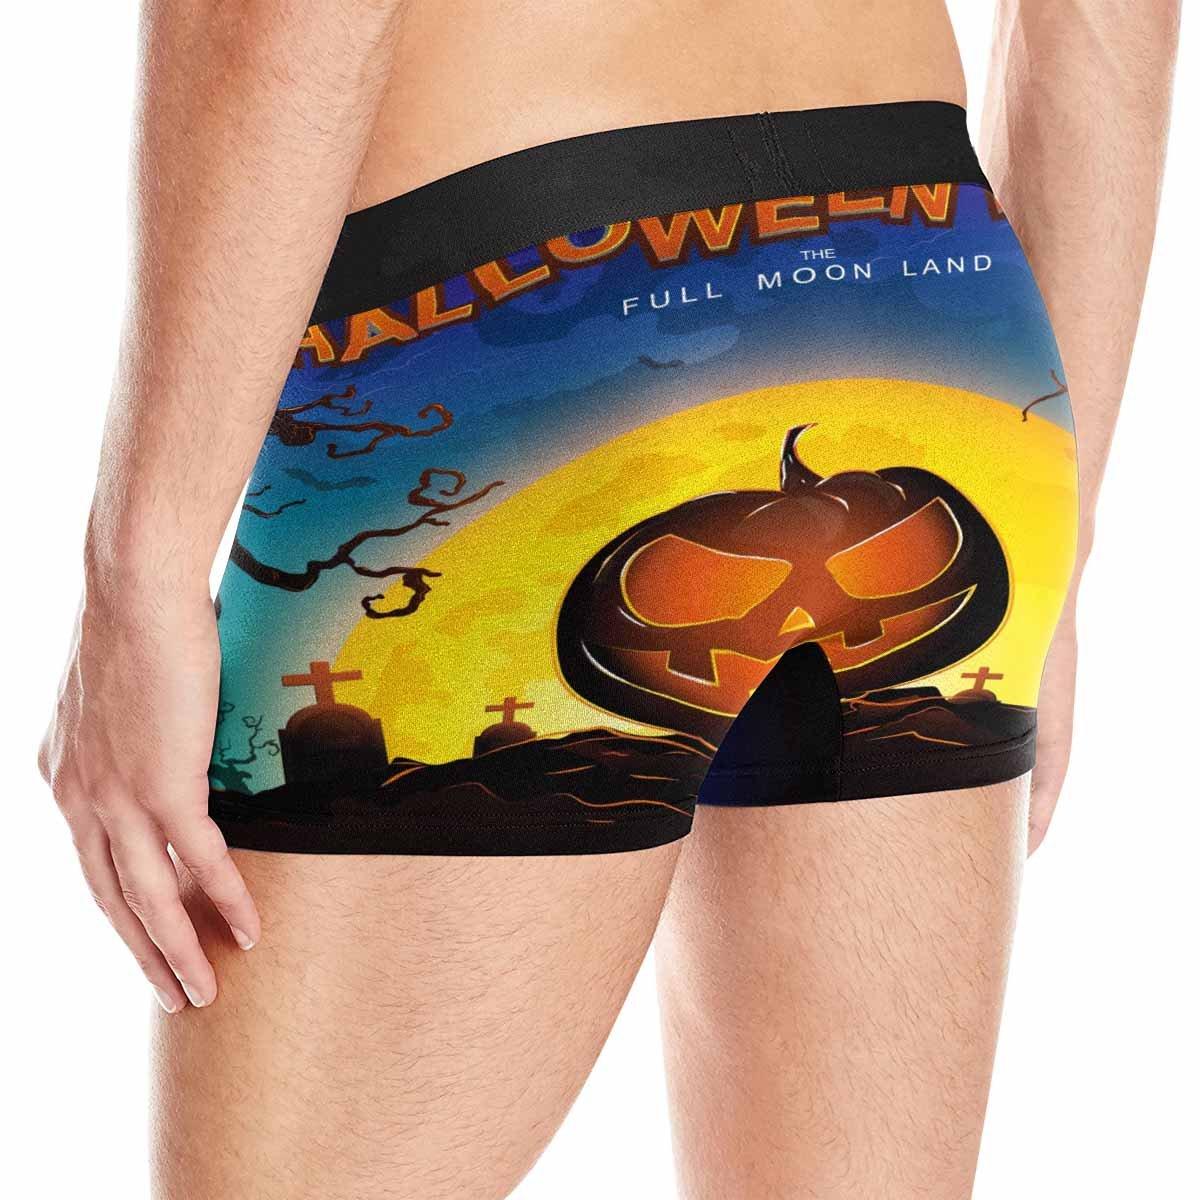 INTERESTPRINT Boxer Briefs Mens Underwear Halloween Party Full Moon Land XS-3XL